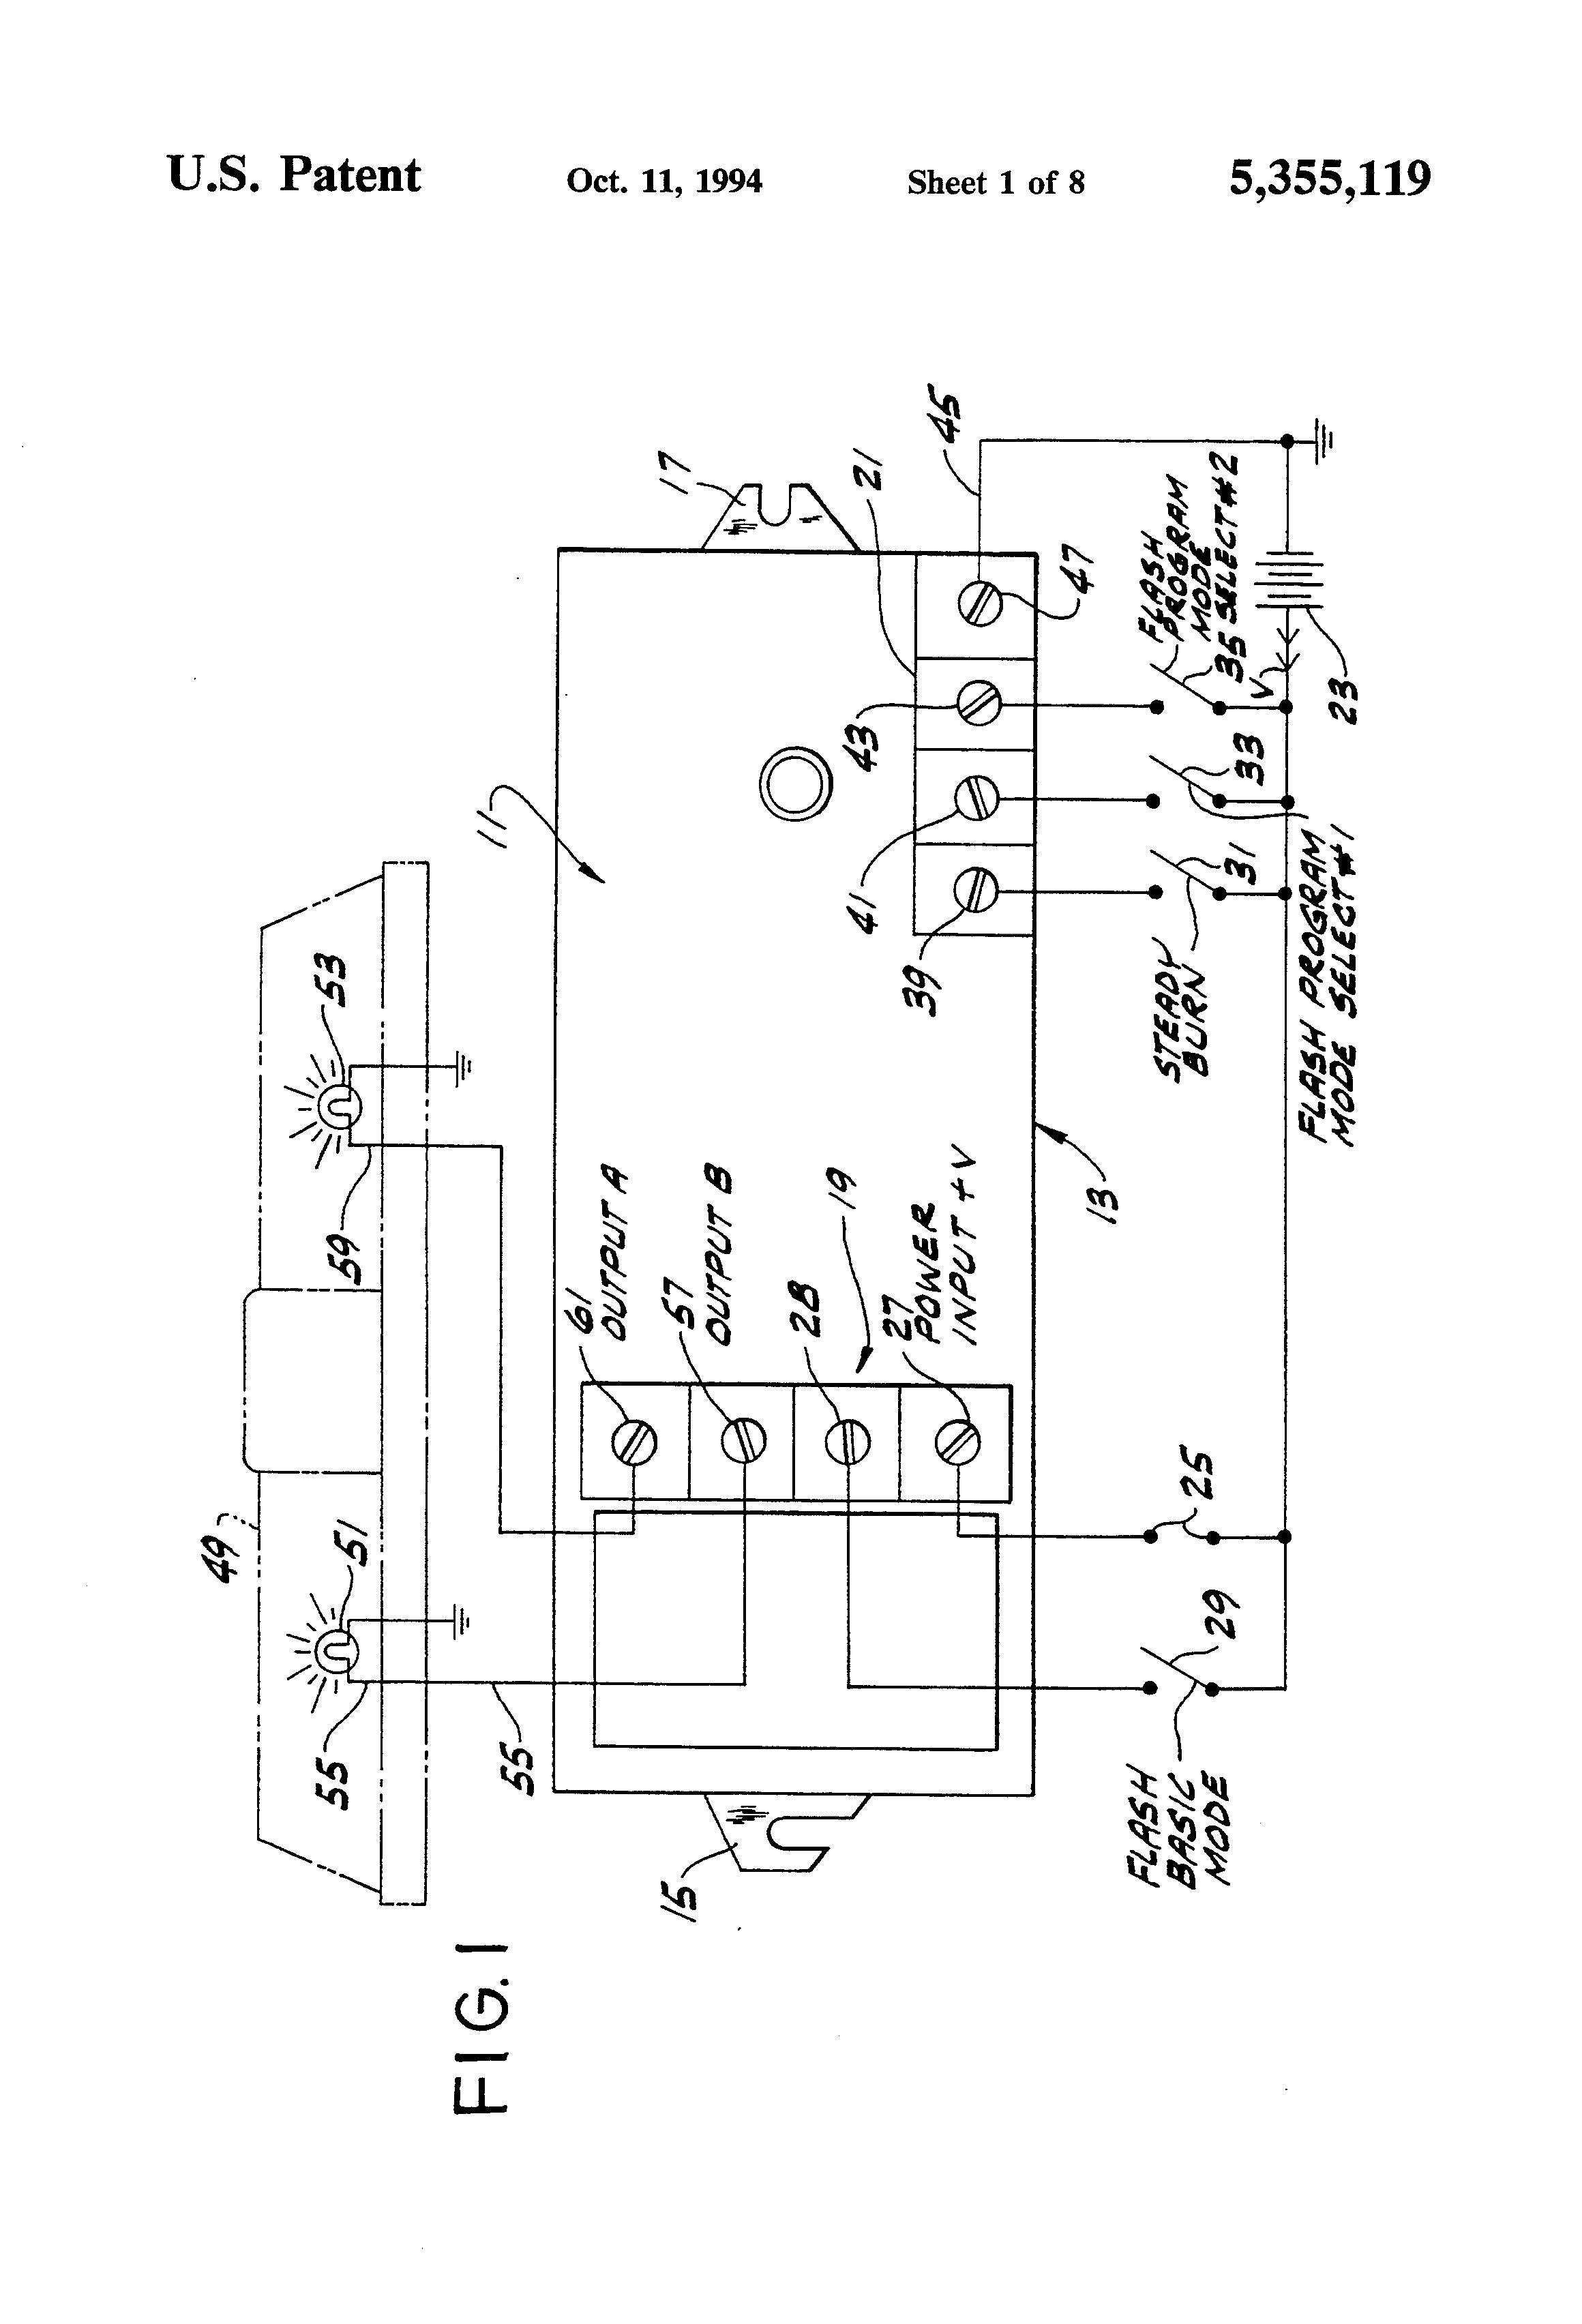 Signal Dynamics Headlight Strobe Wiring Diagram